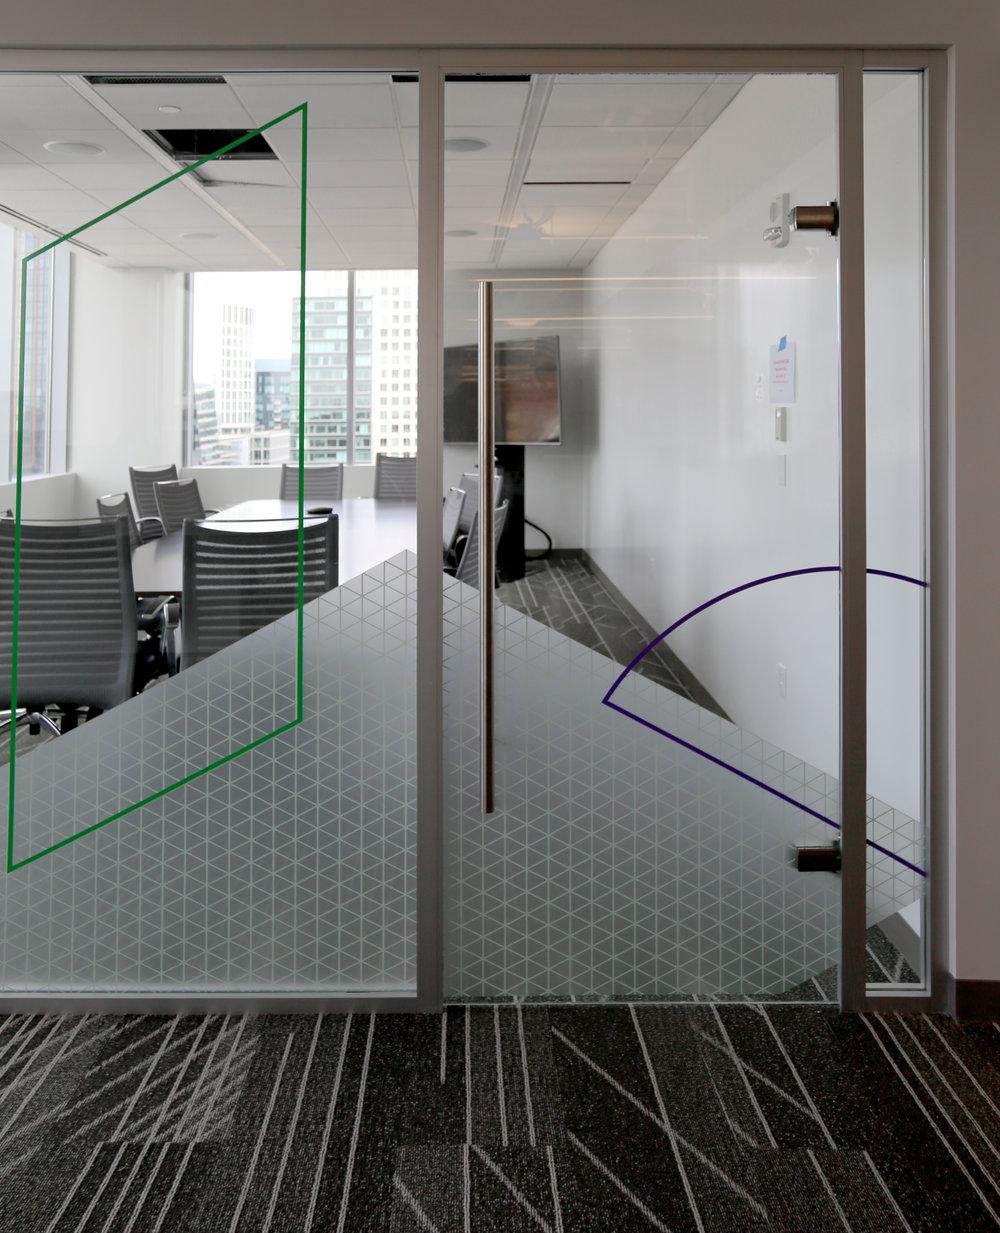 Litespace Frameless Glass Swing Door Hydraulic Hinges - Spaceworks AI.jpg